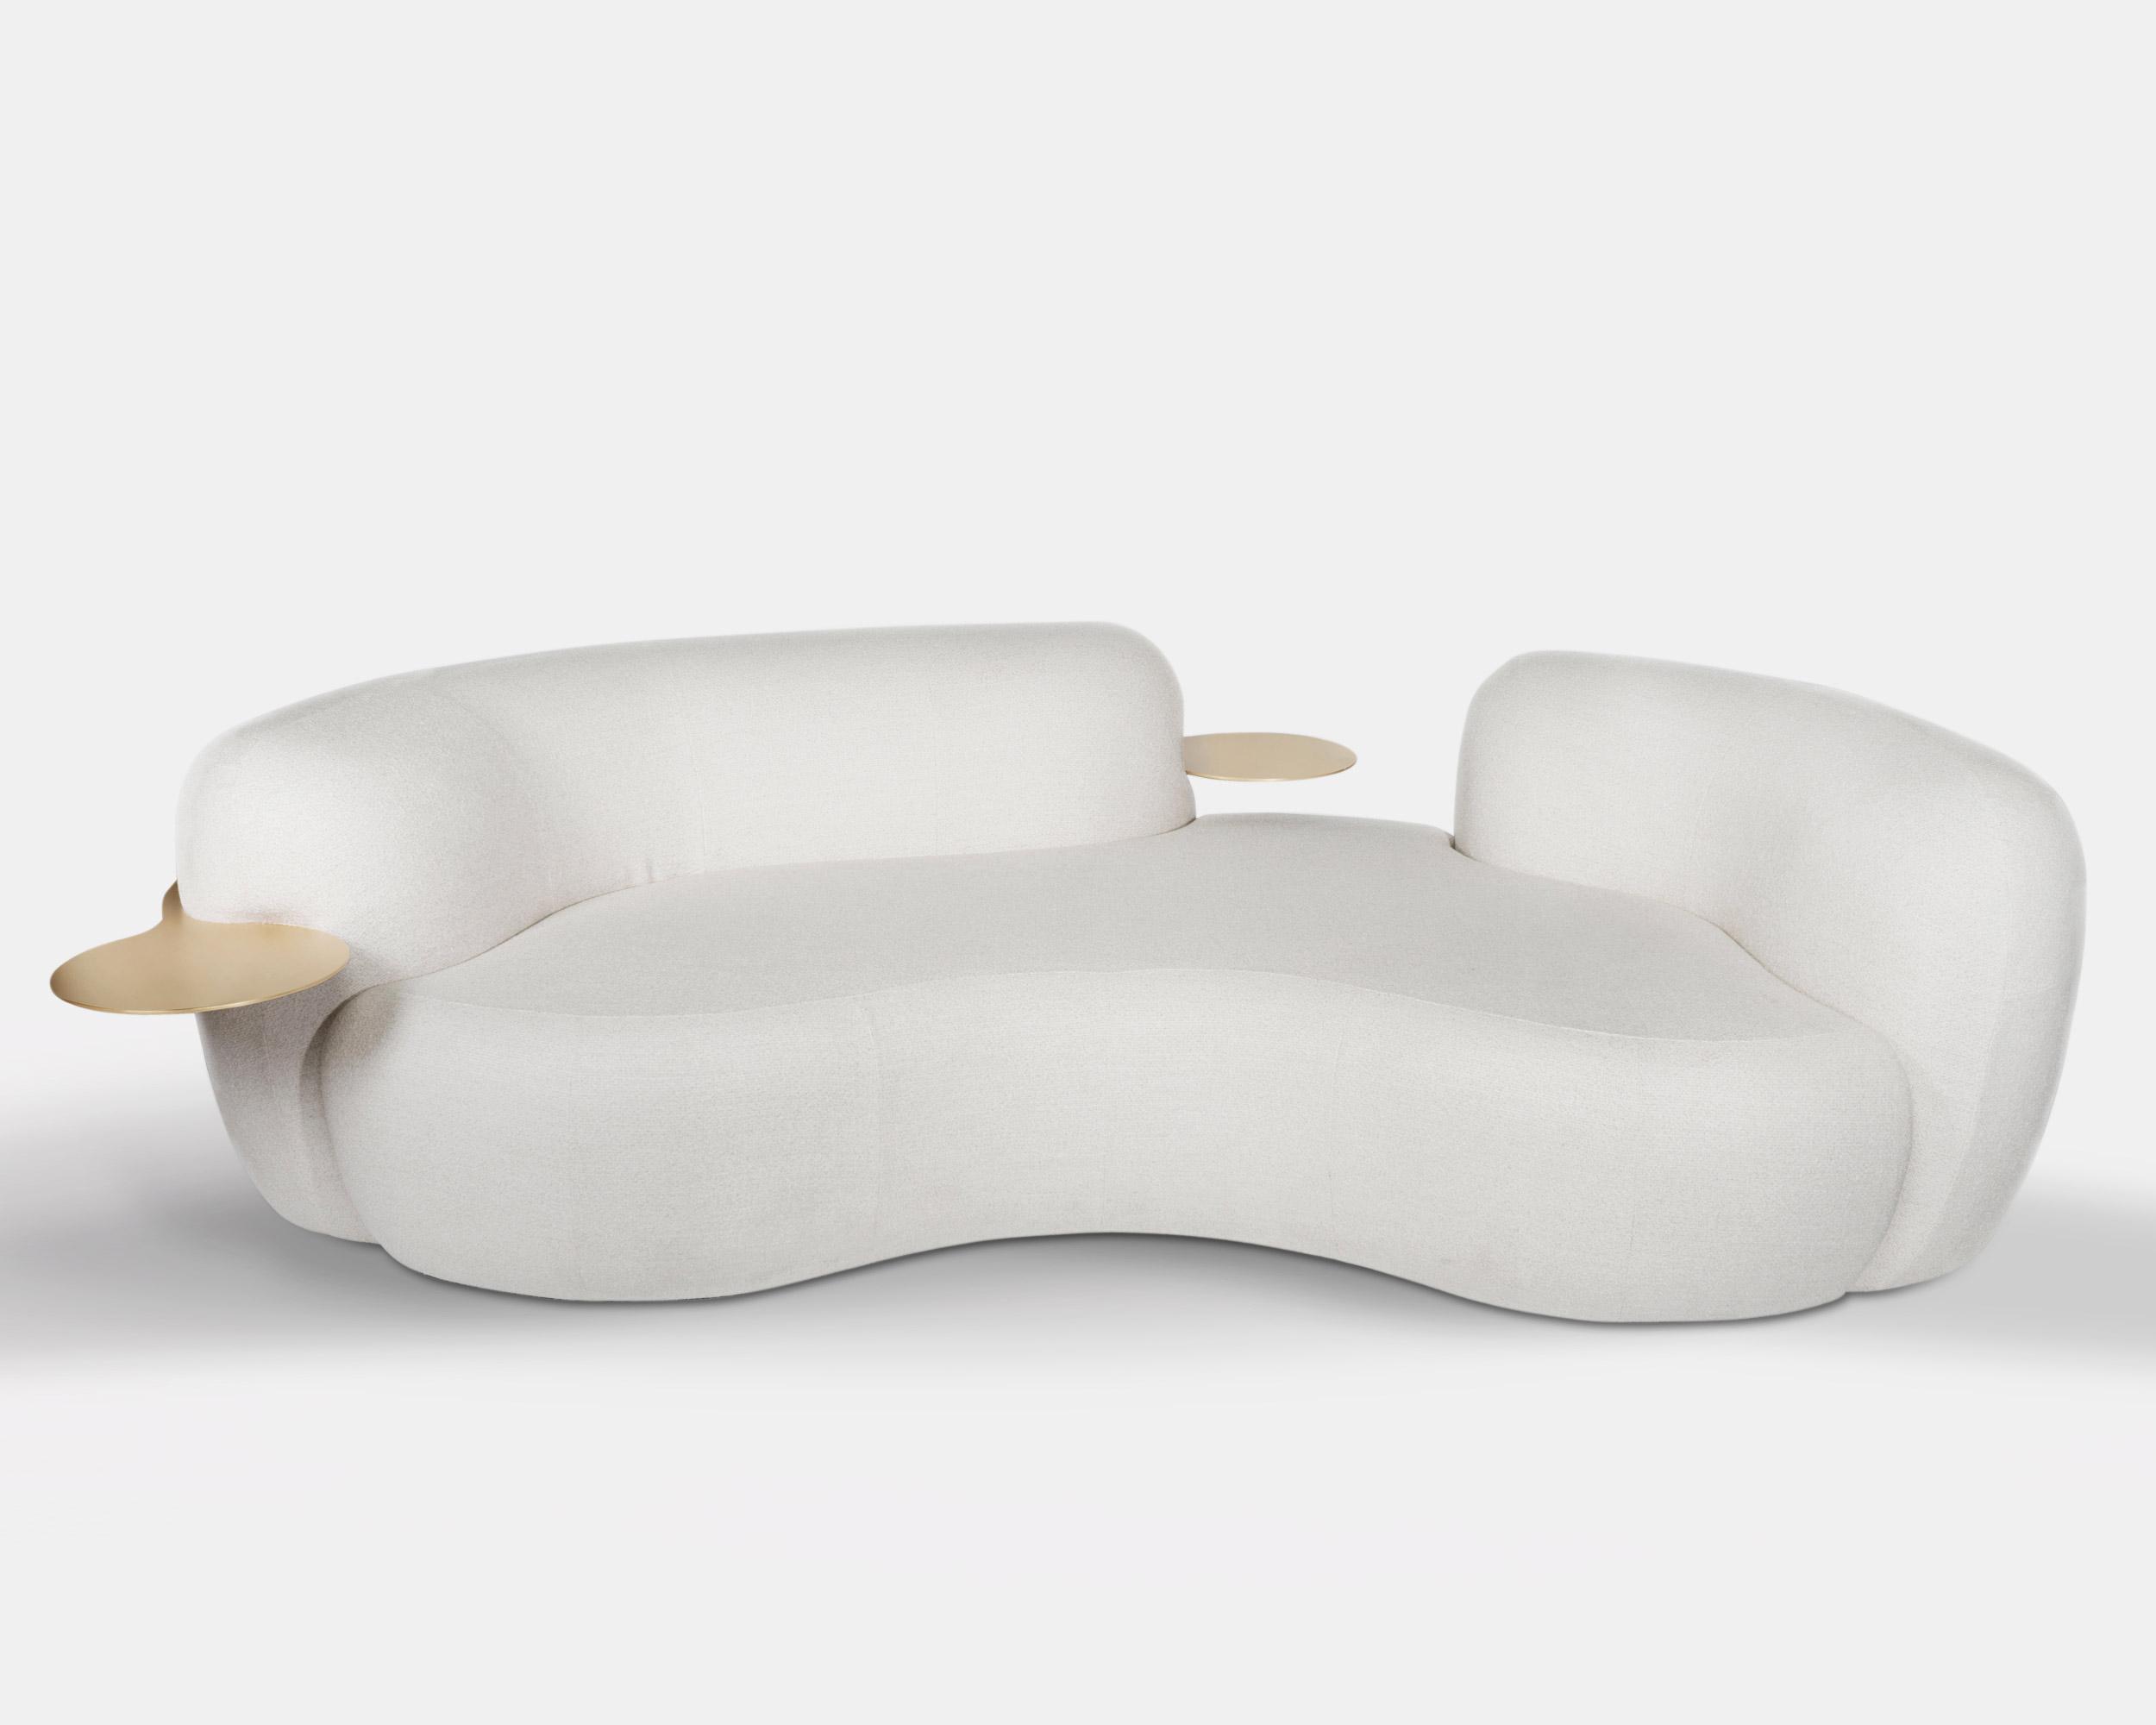 Tateyama Sofa Signed By Artefatto